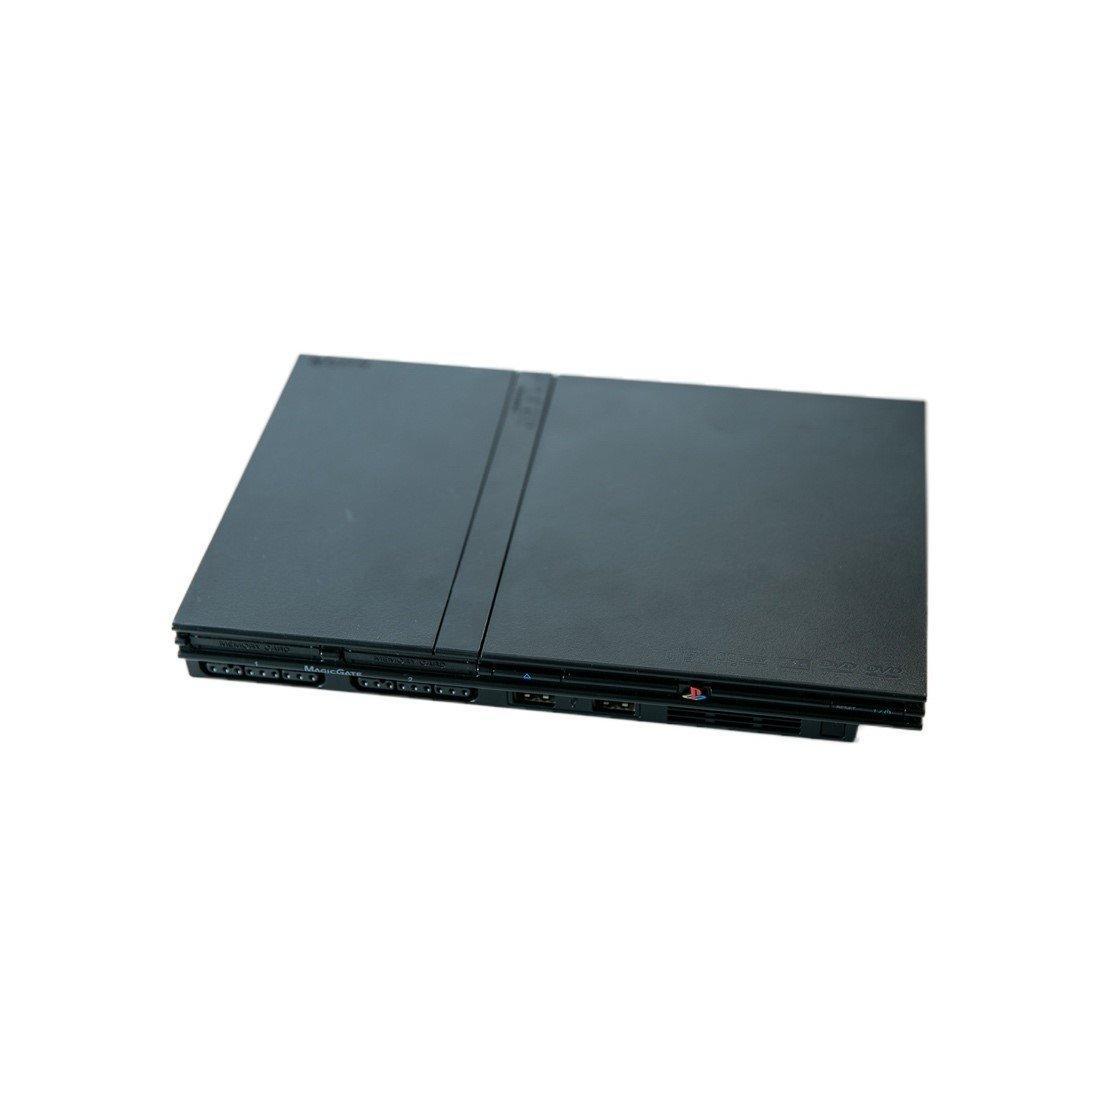 Playstation 2 Slim Playstation 2 Gamestop